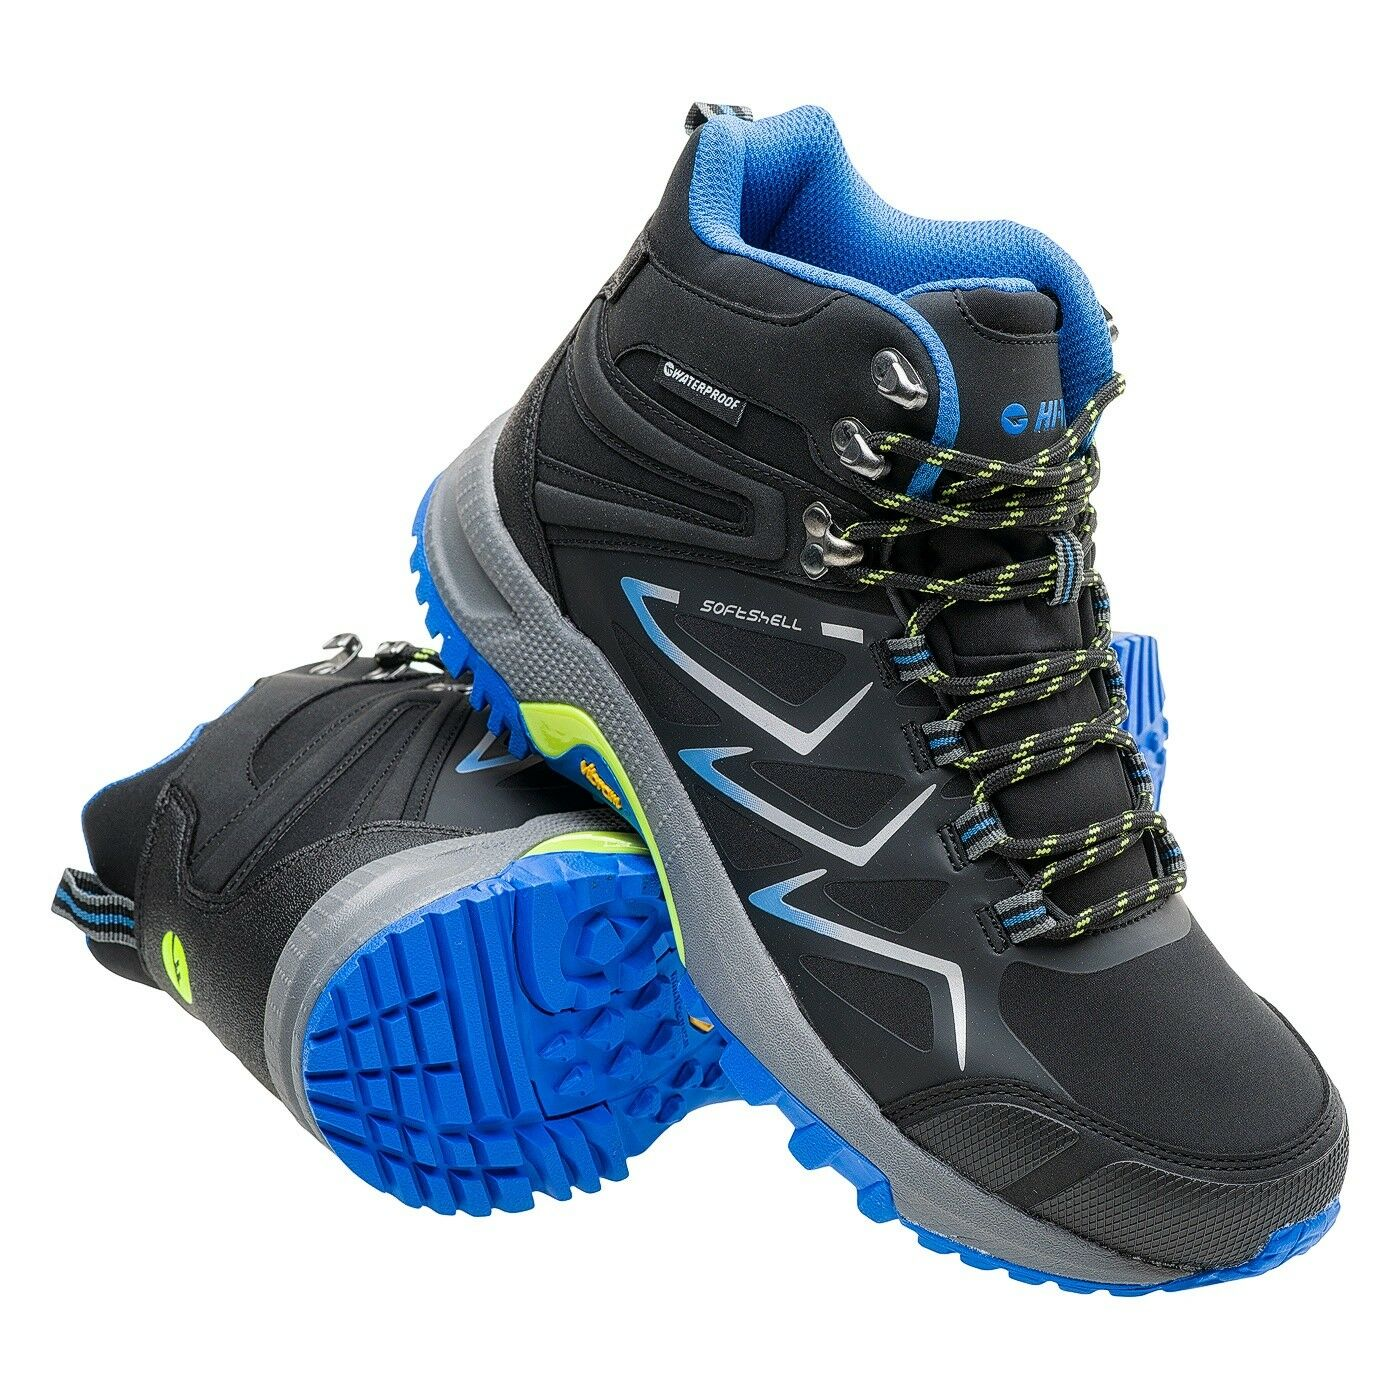 Hi-Tec  Reiko Medio Wp Hombre Zapatillas de Senderismo Trekking Zapatos  Centro comercial profesional integrado en línea.